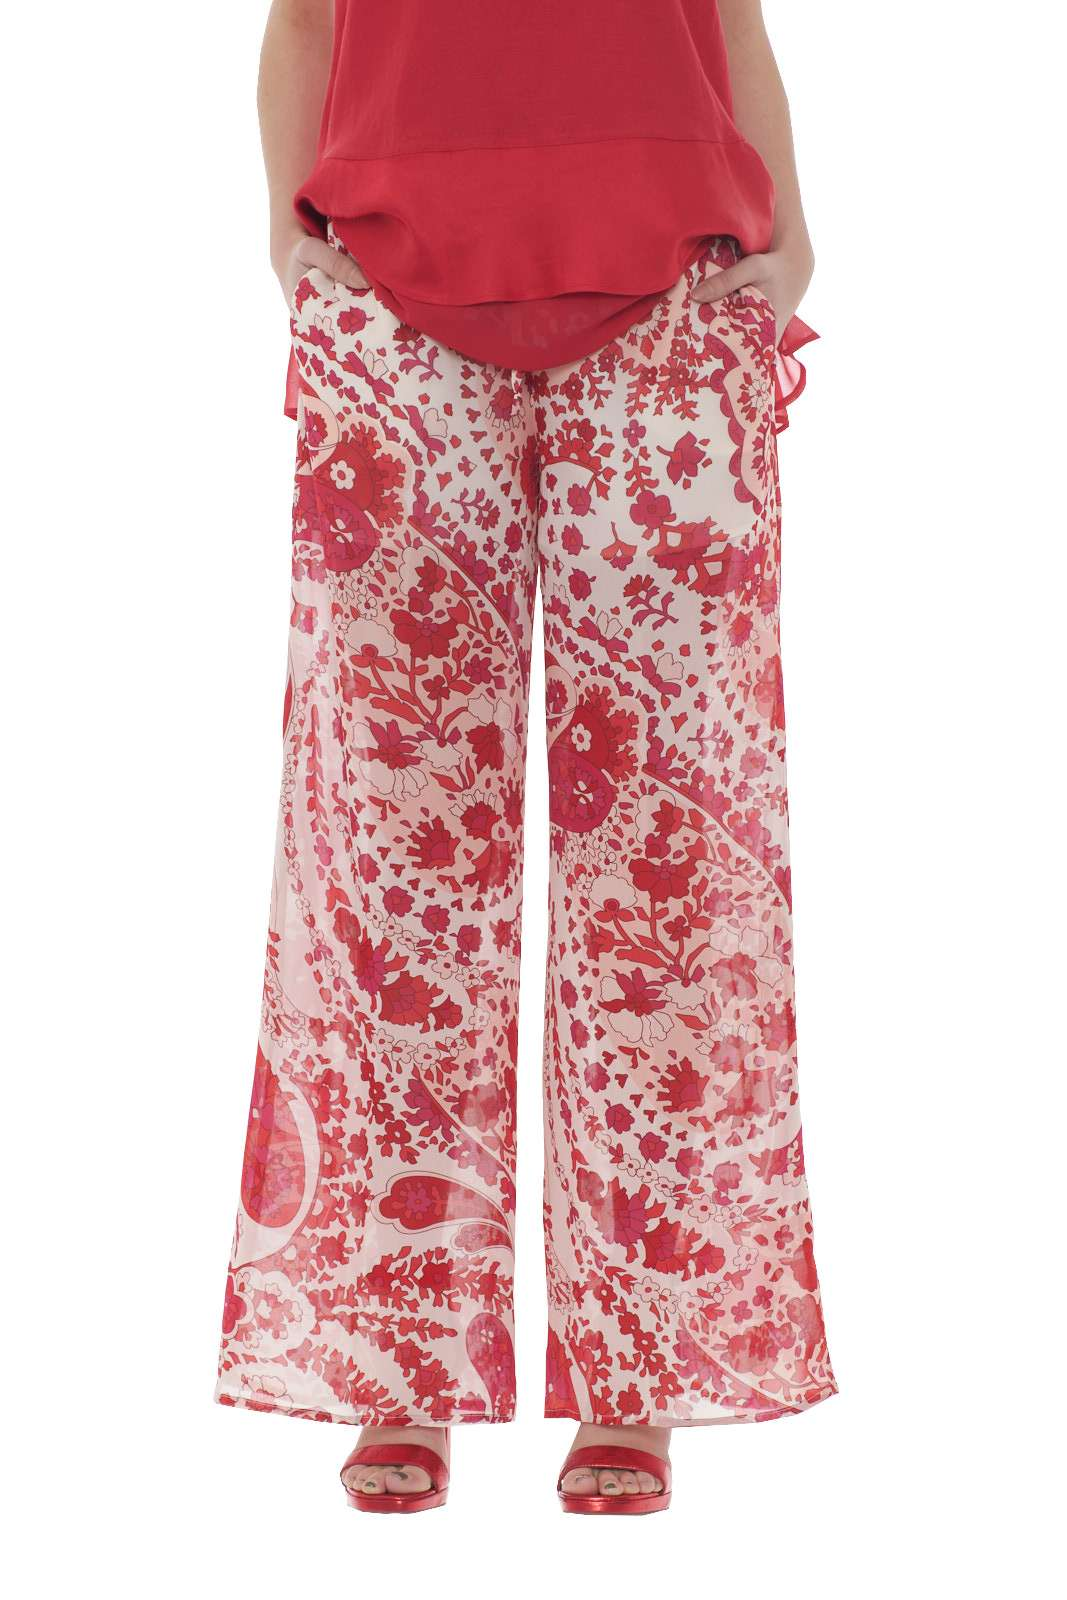 https://www.parmax.com/media/catalog/product/a/i/PE-outlet_parmax-pantaloni-donna-TwinSet-201TP2536-A.jpg